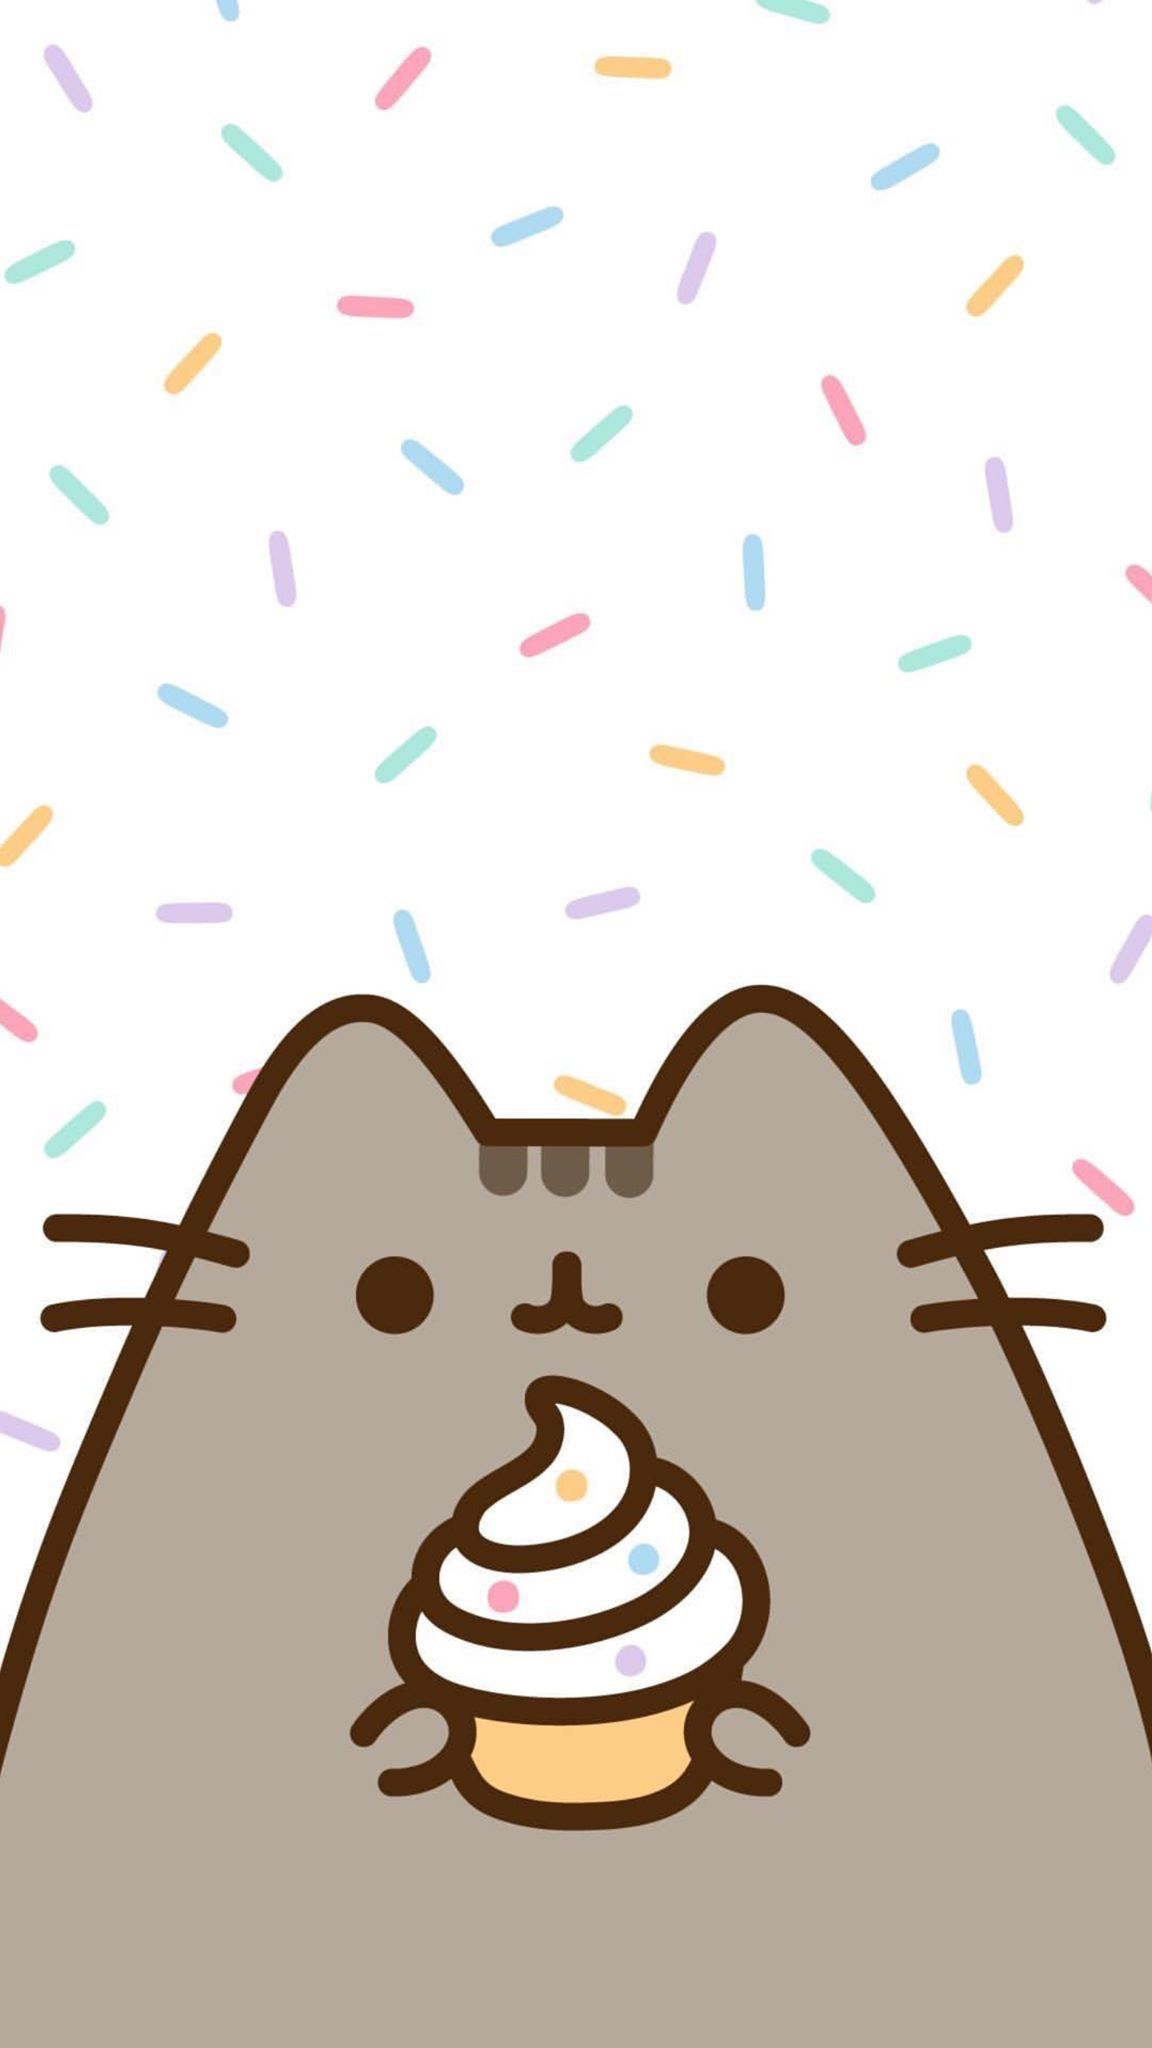 Pin By Caellita Liss On Pusheen Pusheen Cat Cute Wallpapers Kawaii Wallpaper